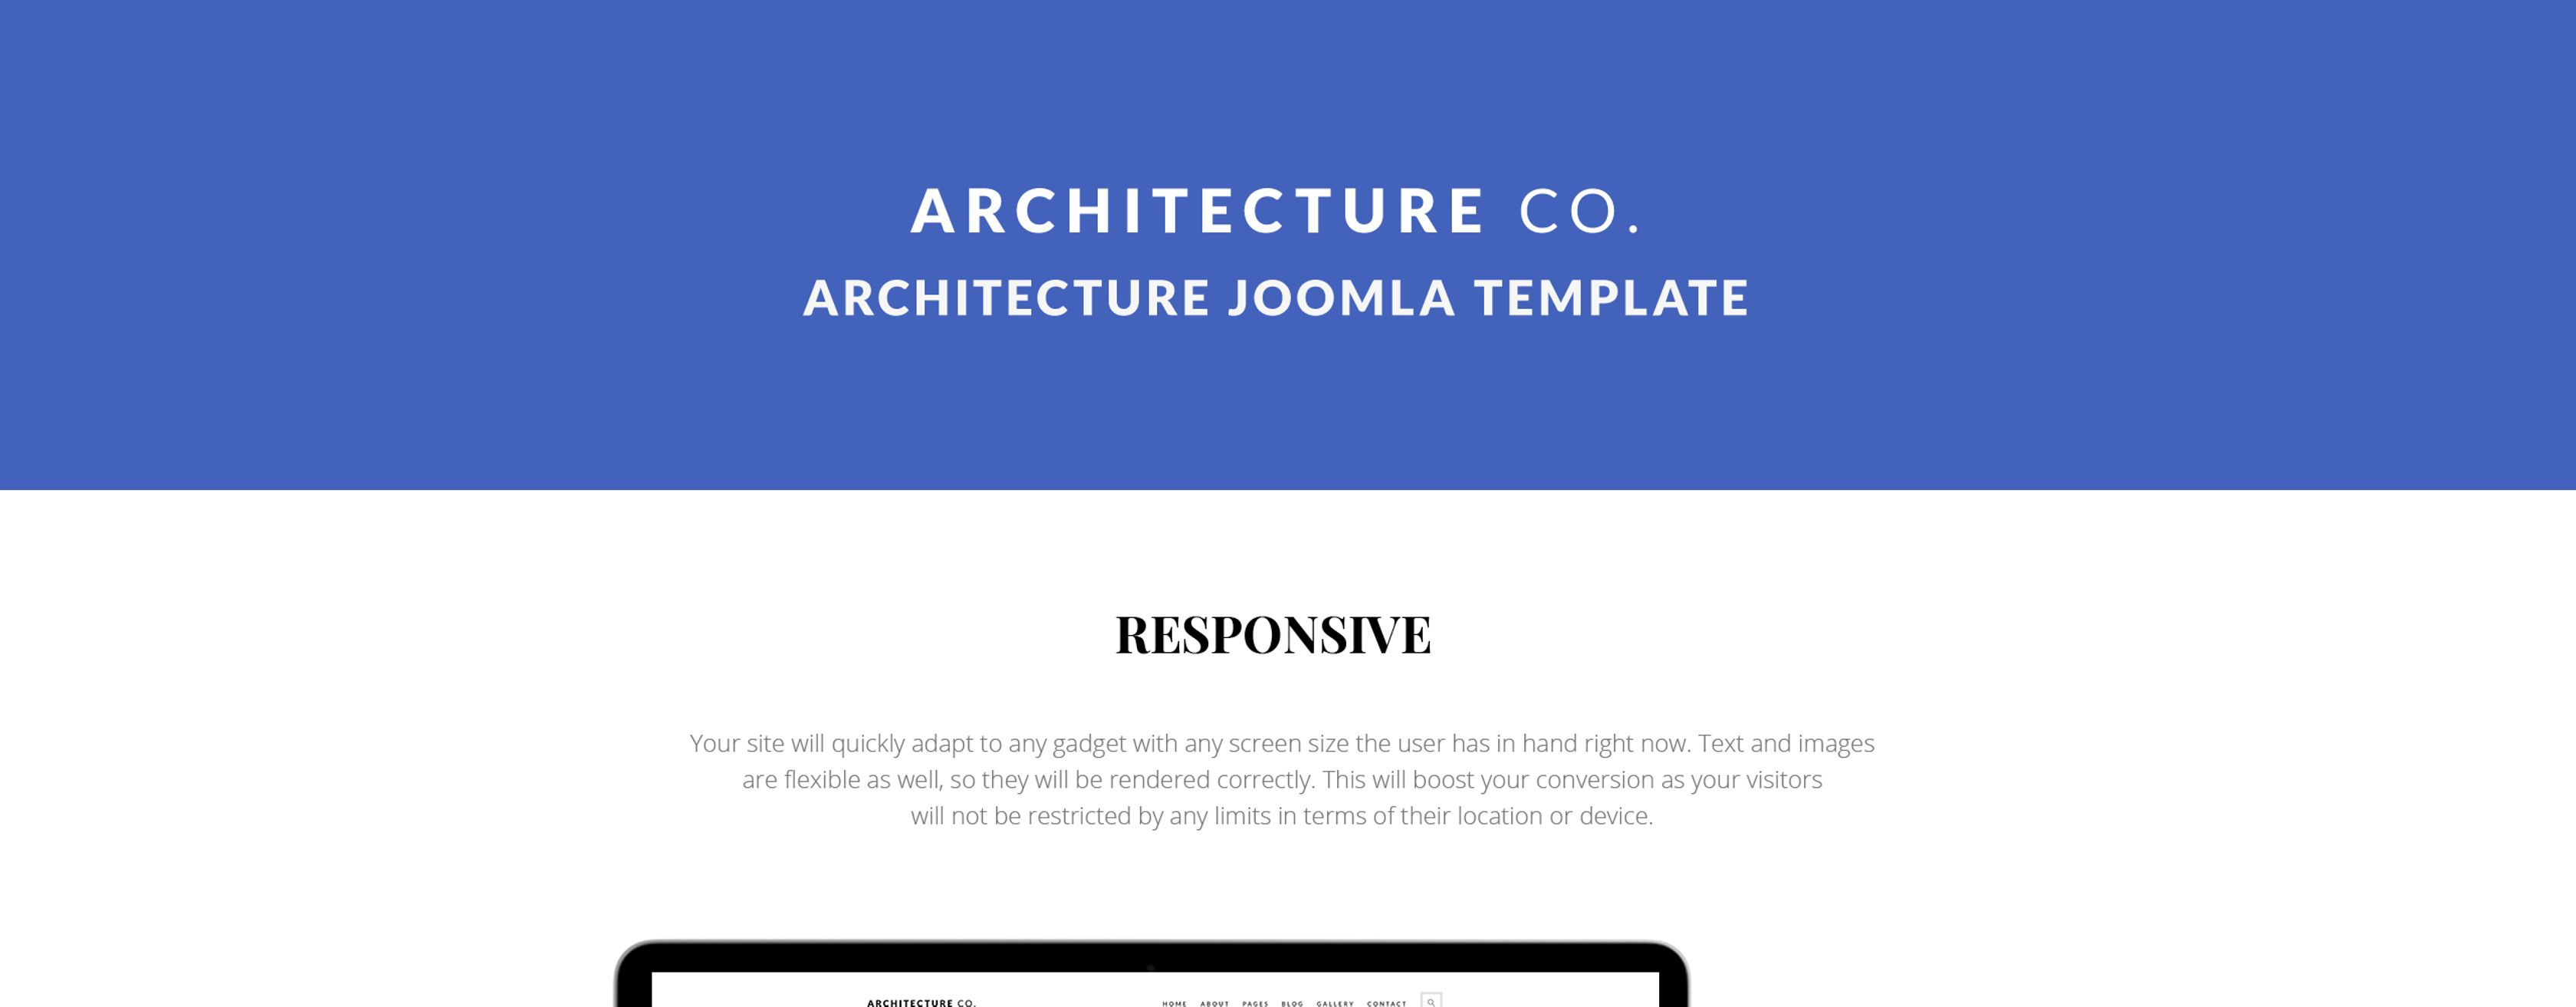 Architecture Co - Construction Company Joomla Template